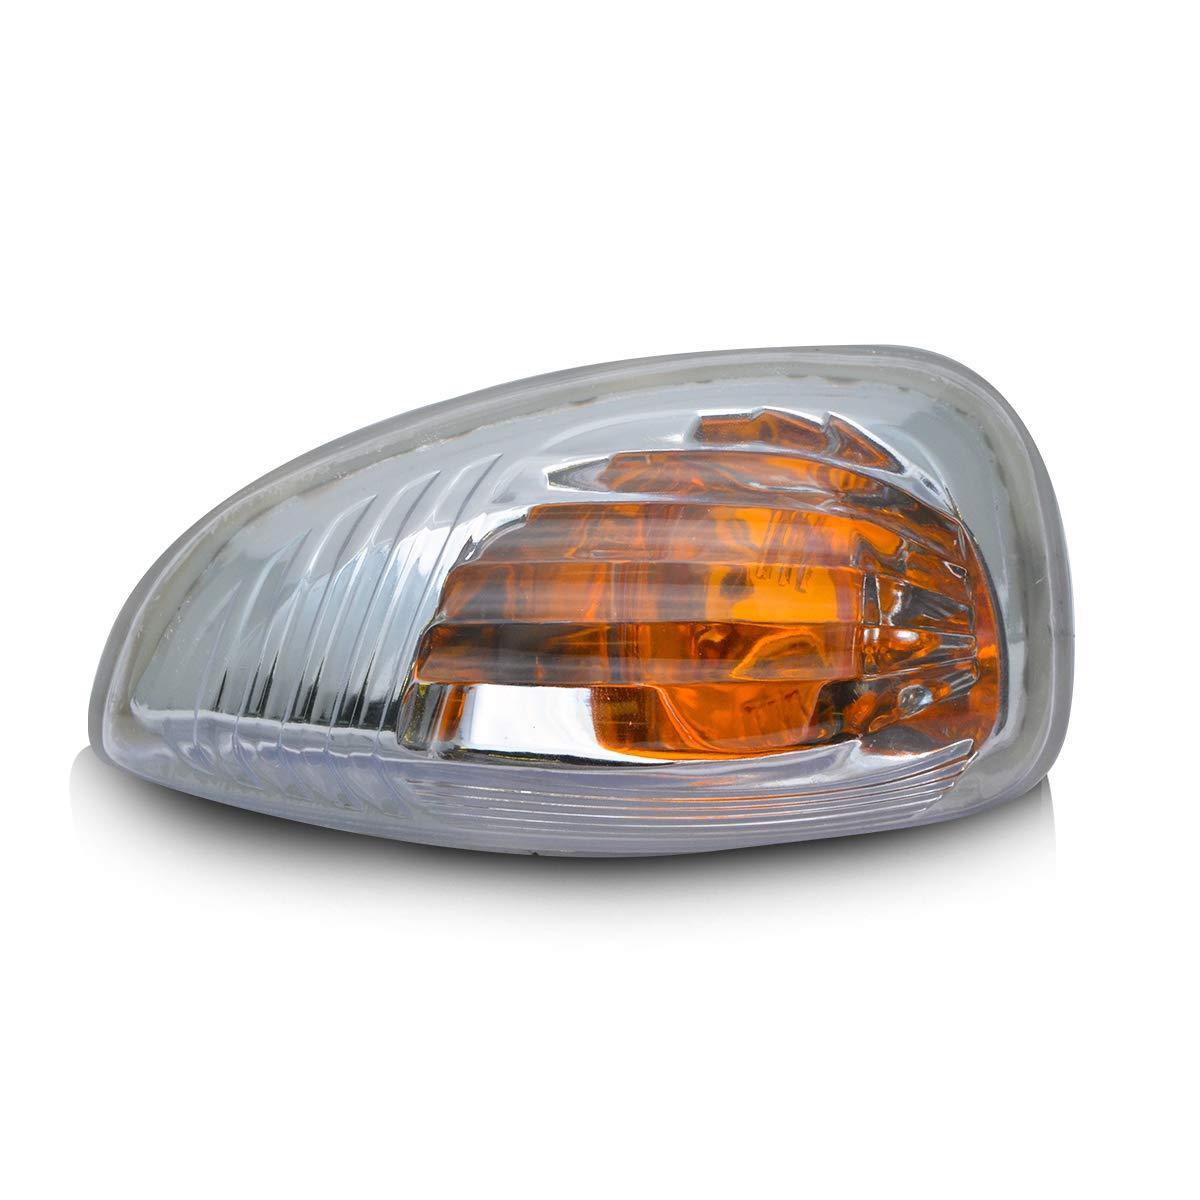 MASO Left Wing Mirror Indicator Lamp Lens Turn Signal Lights for Ford Transit MK8 2014